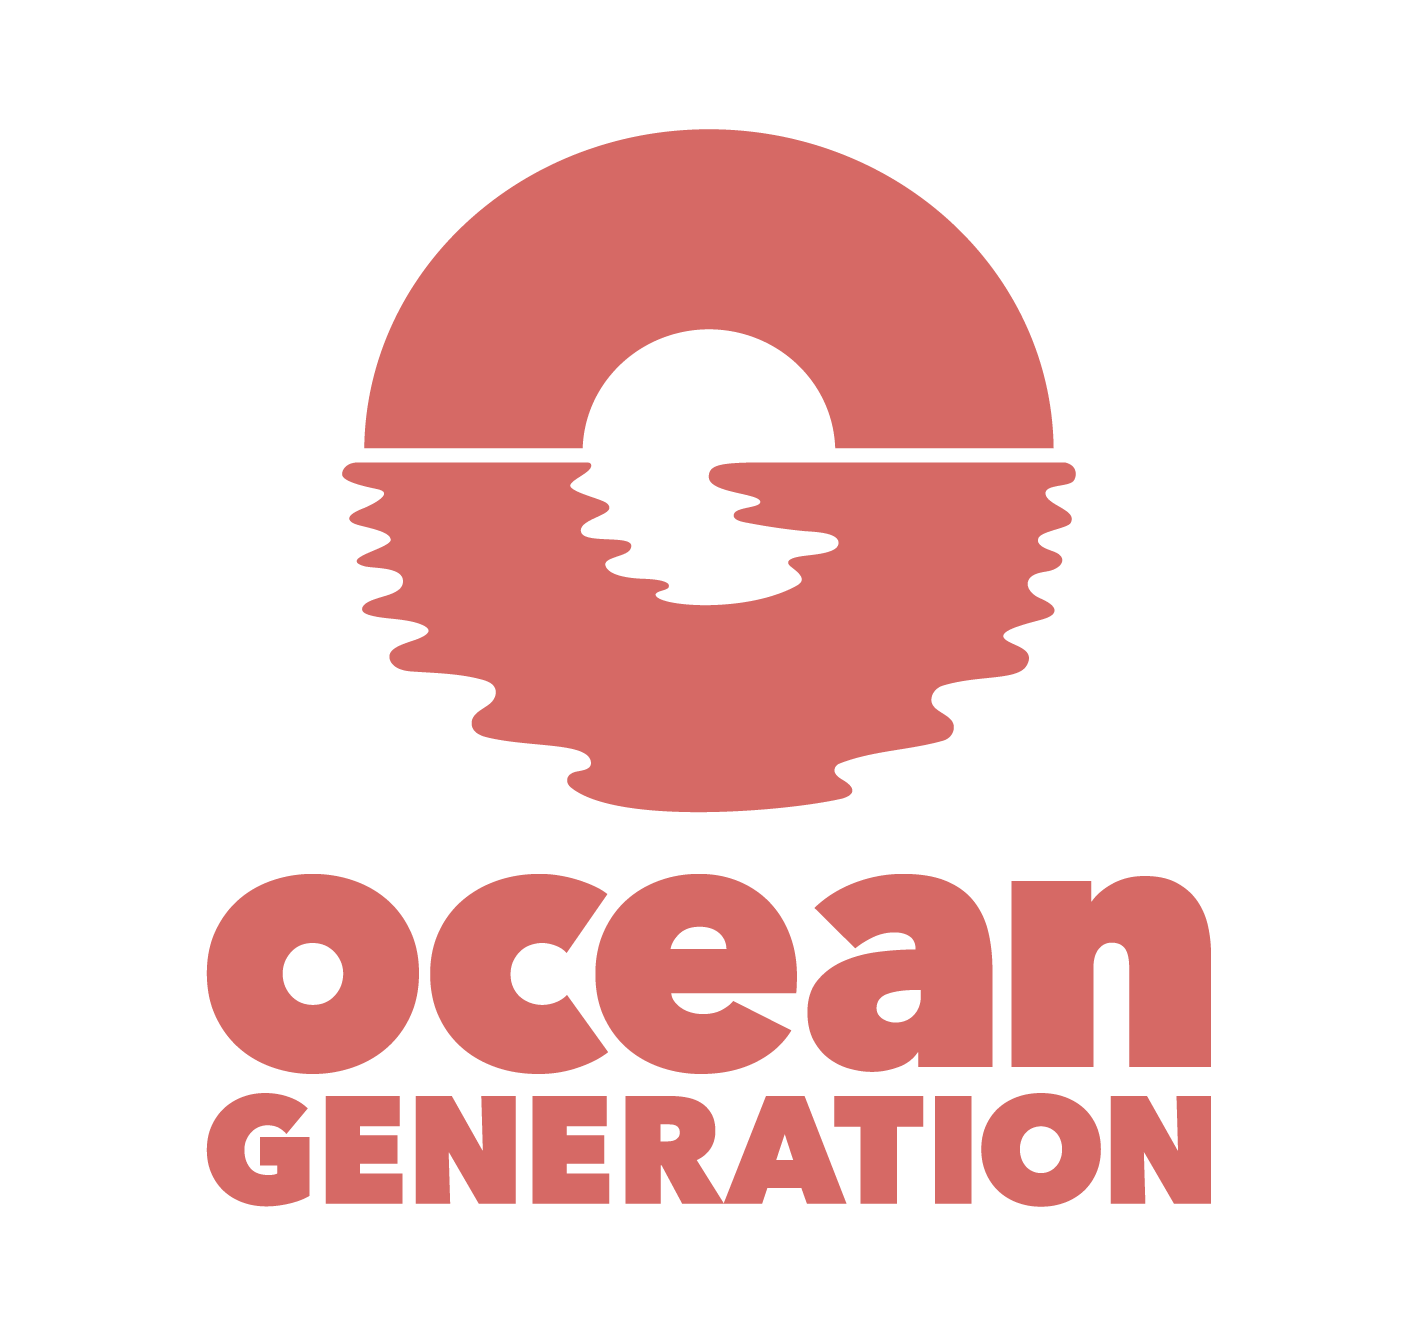 OceanGeneration_LockUp_RGB